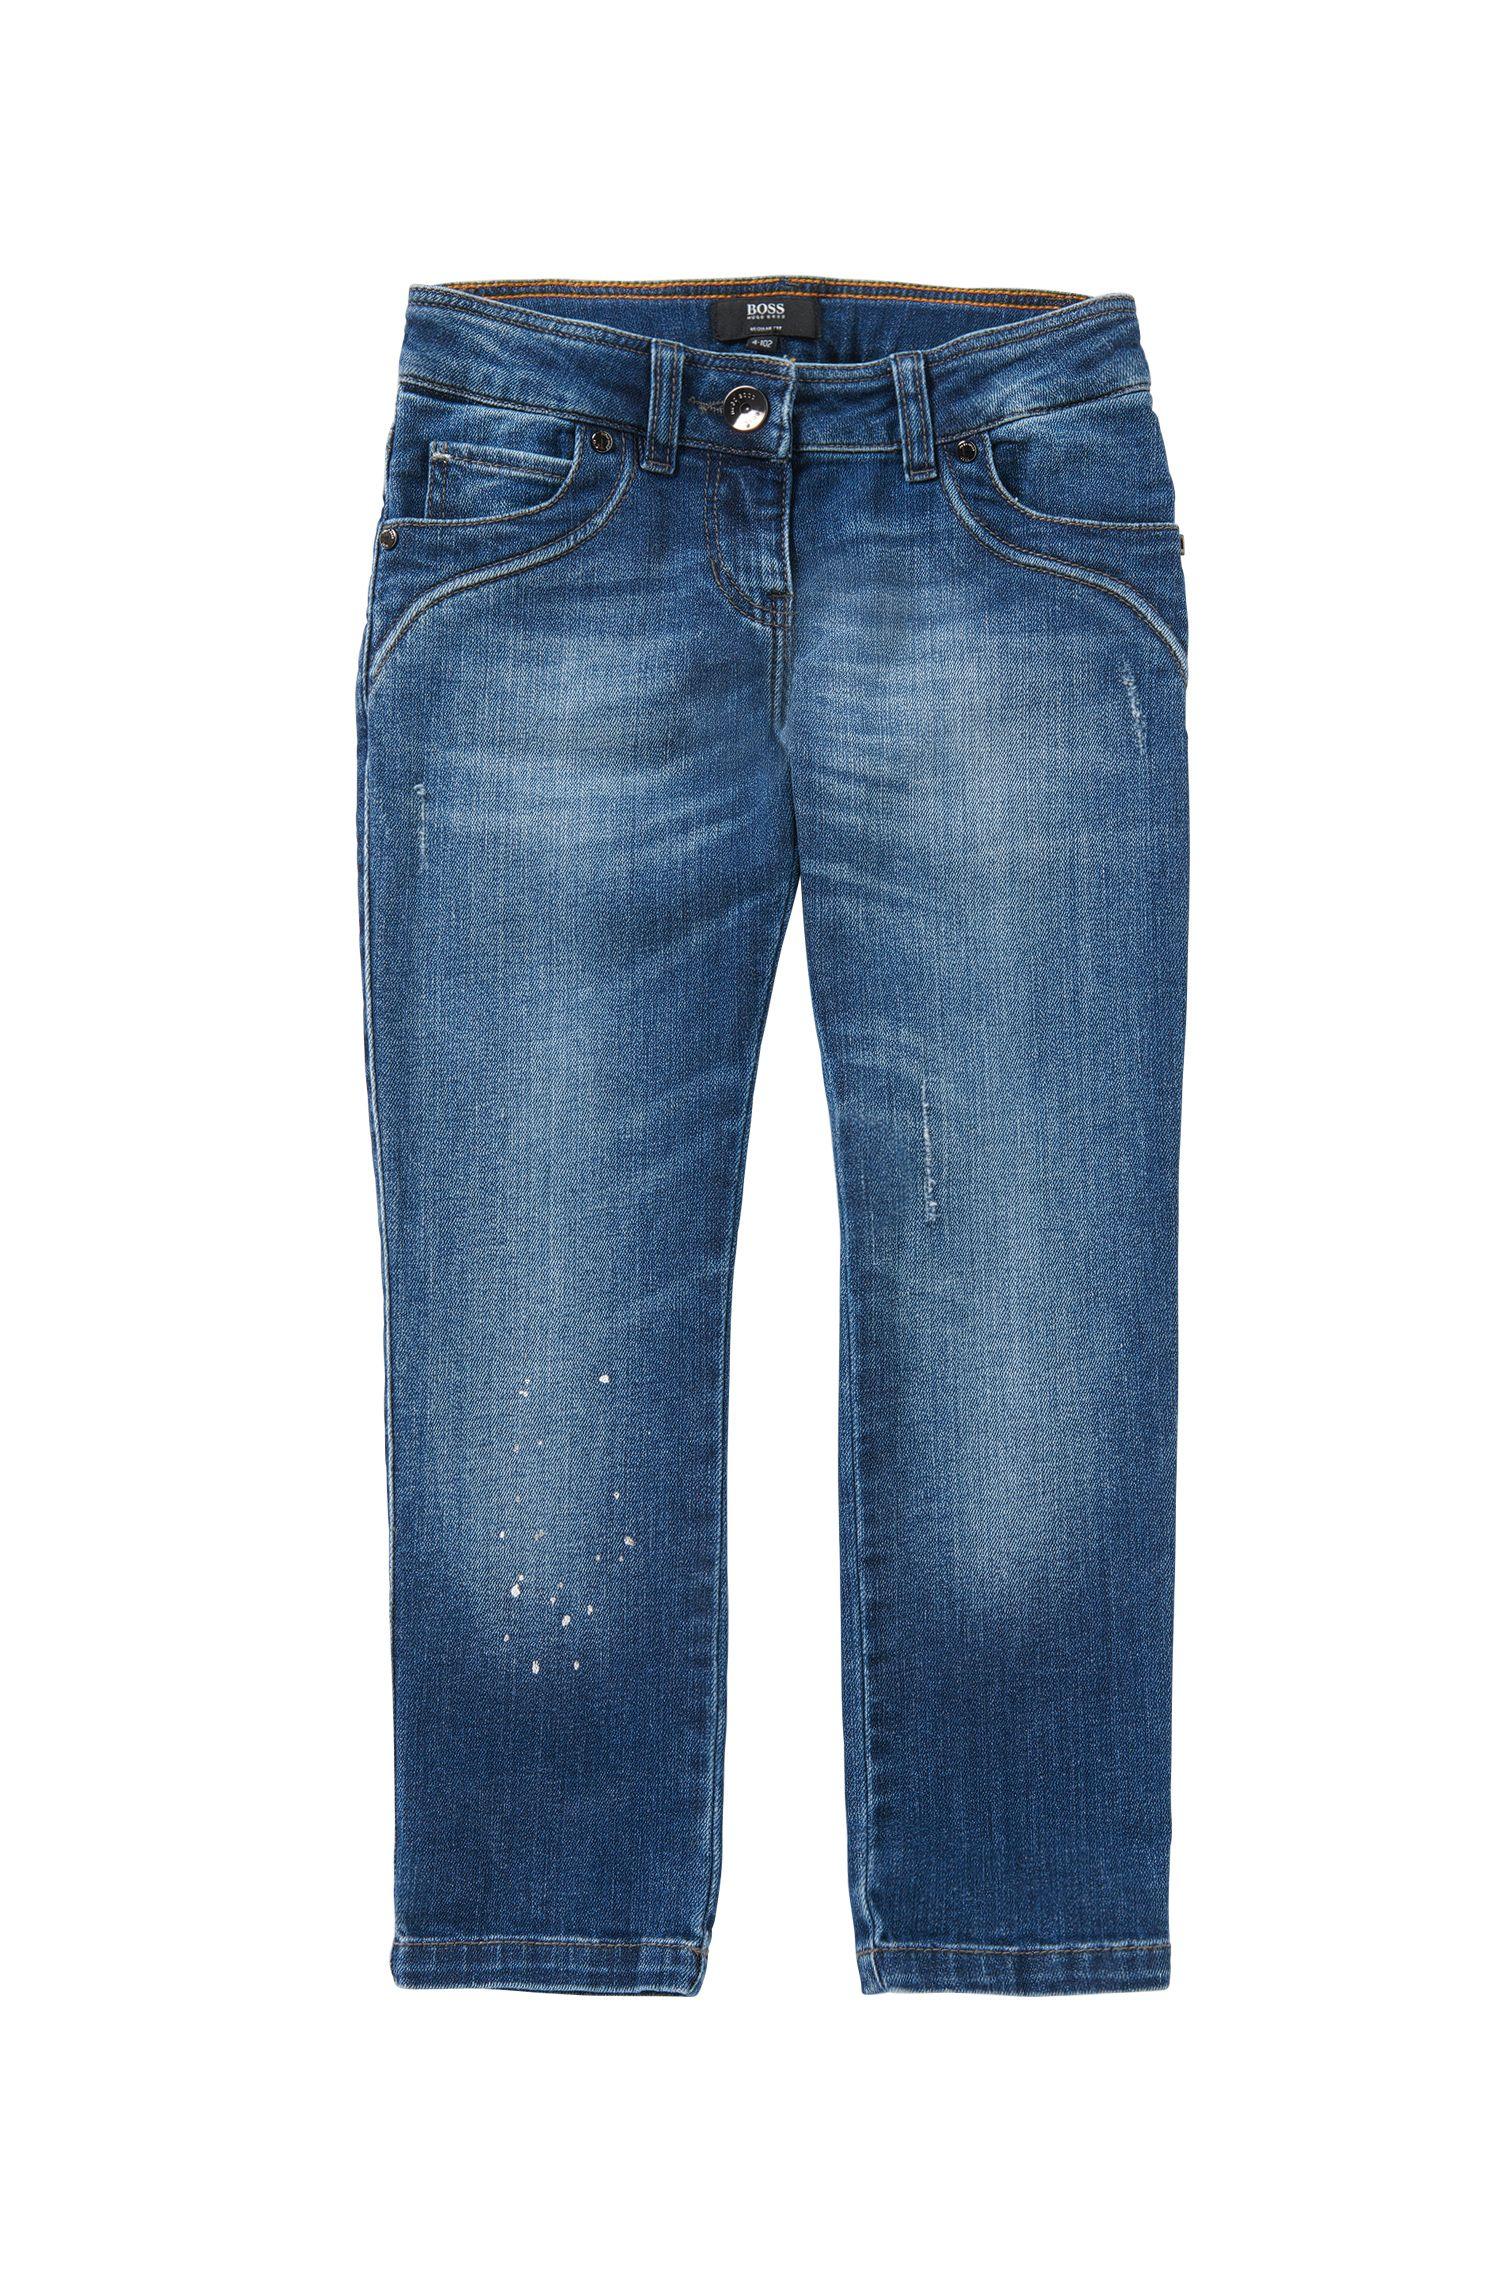 'J14181'   Girls Stretch Cotton Blend Jeans